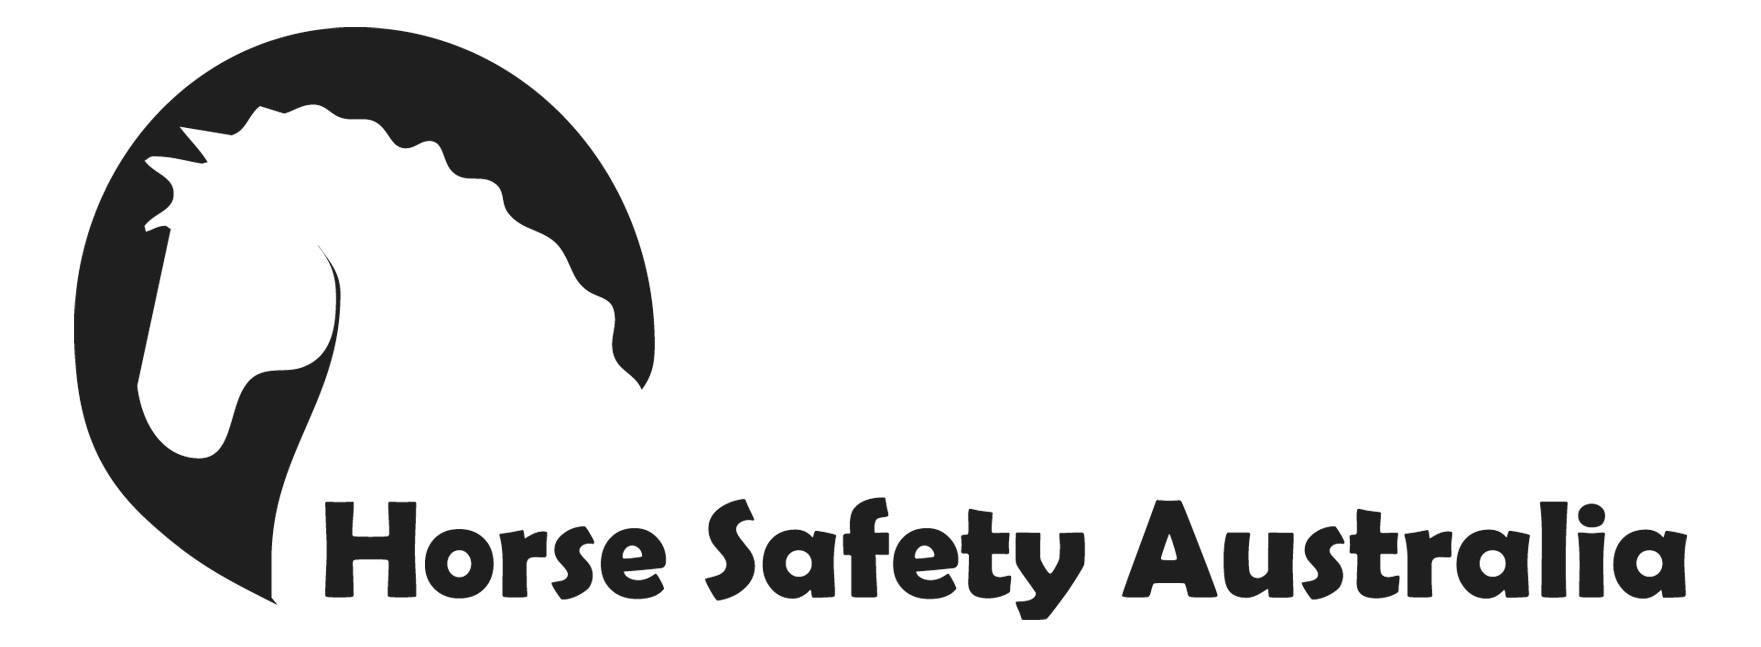 Horse Safety Australia